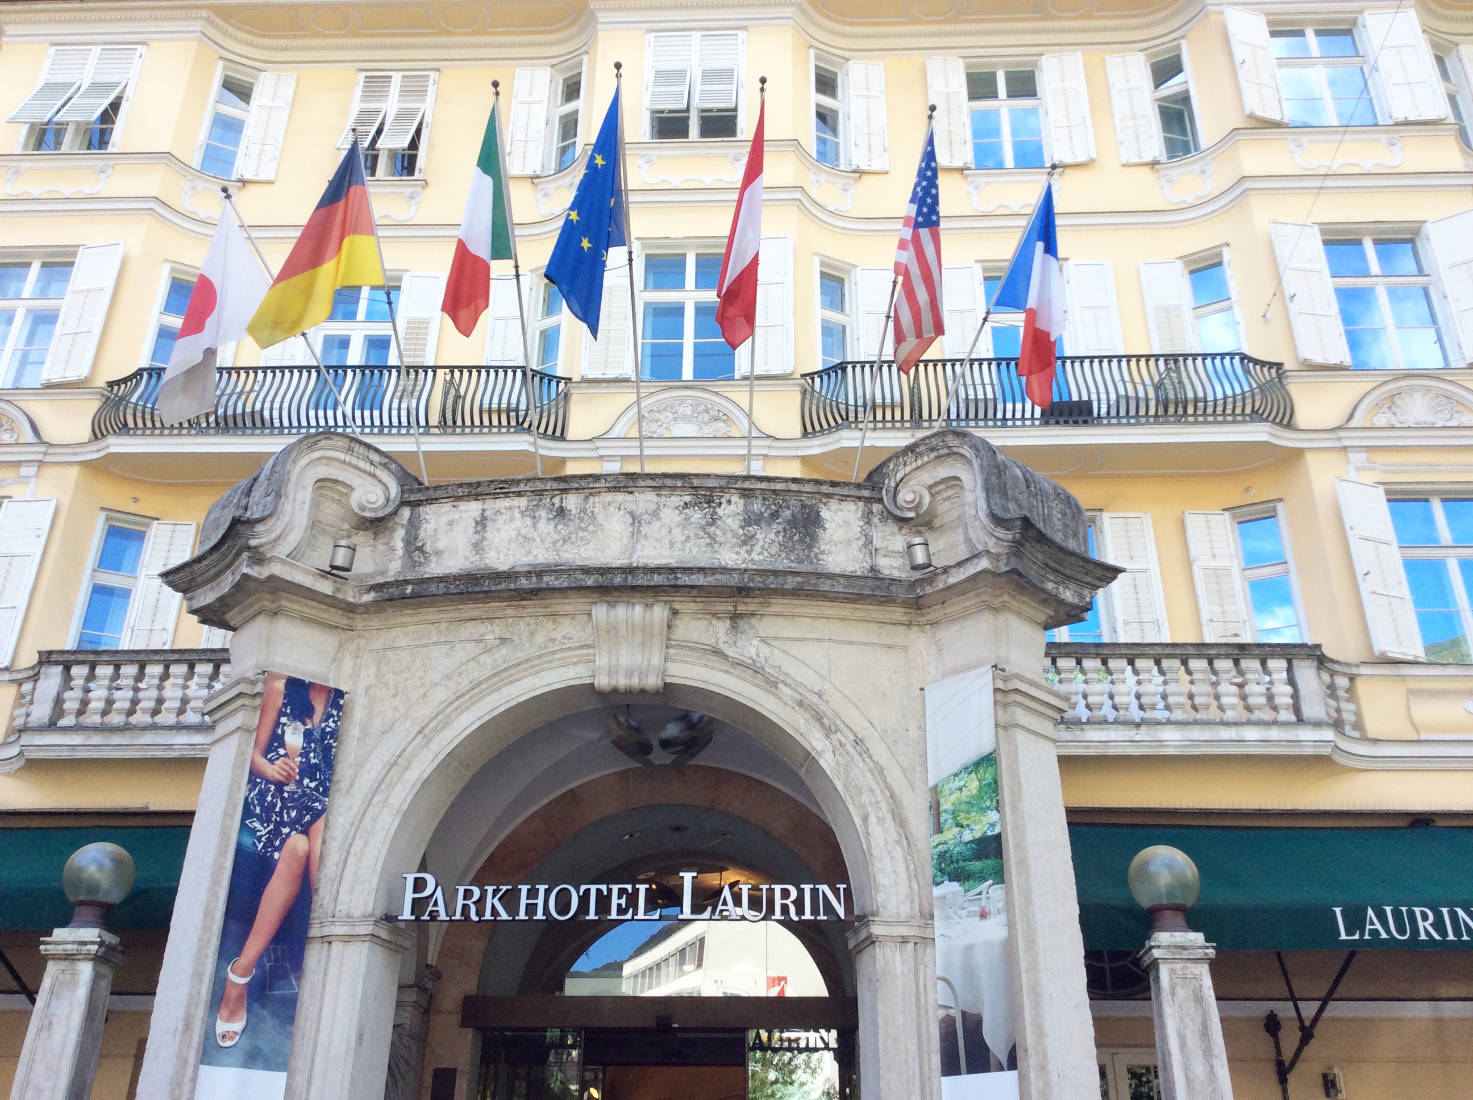 Das Park Hotel Laurin in Bozen